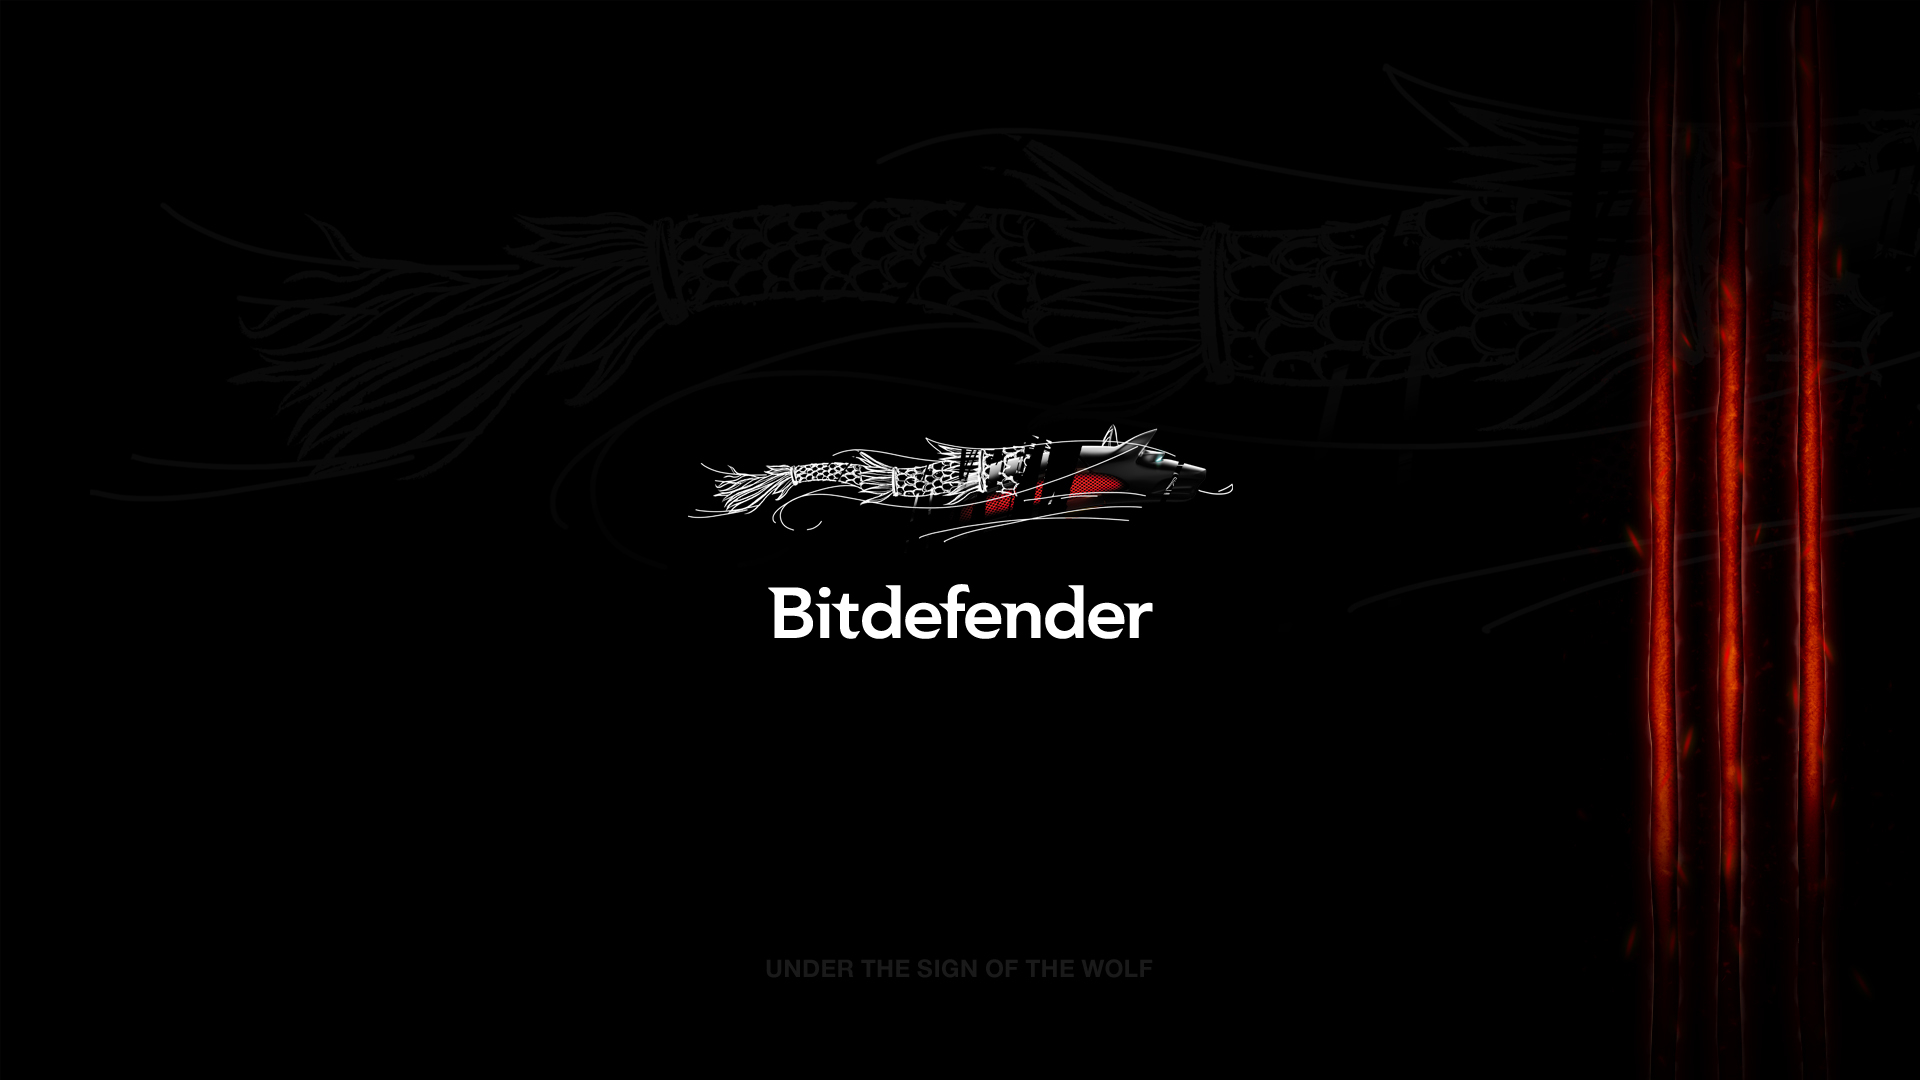 Free download Bitdefender Wallpapers Logos Download HD Images